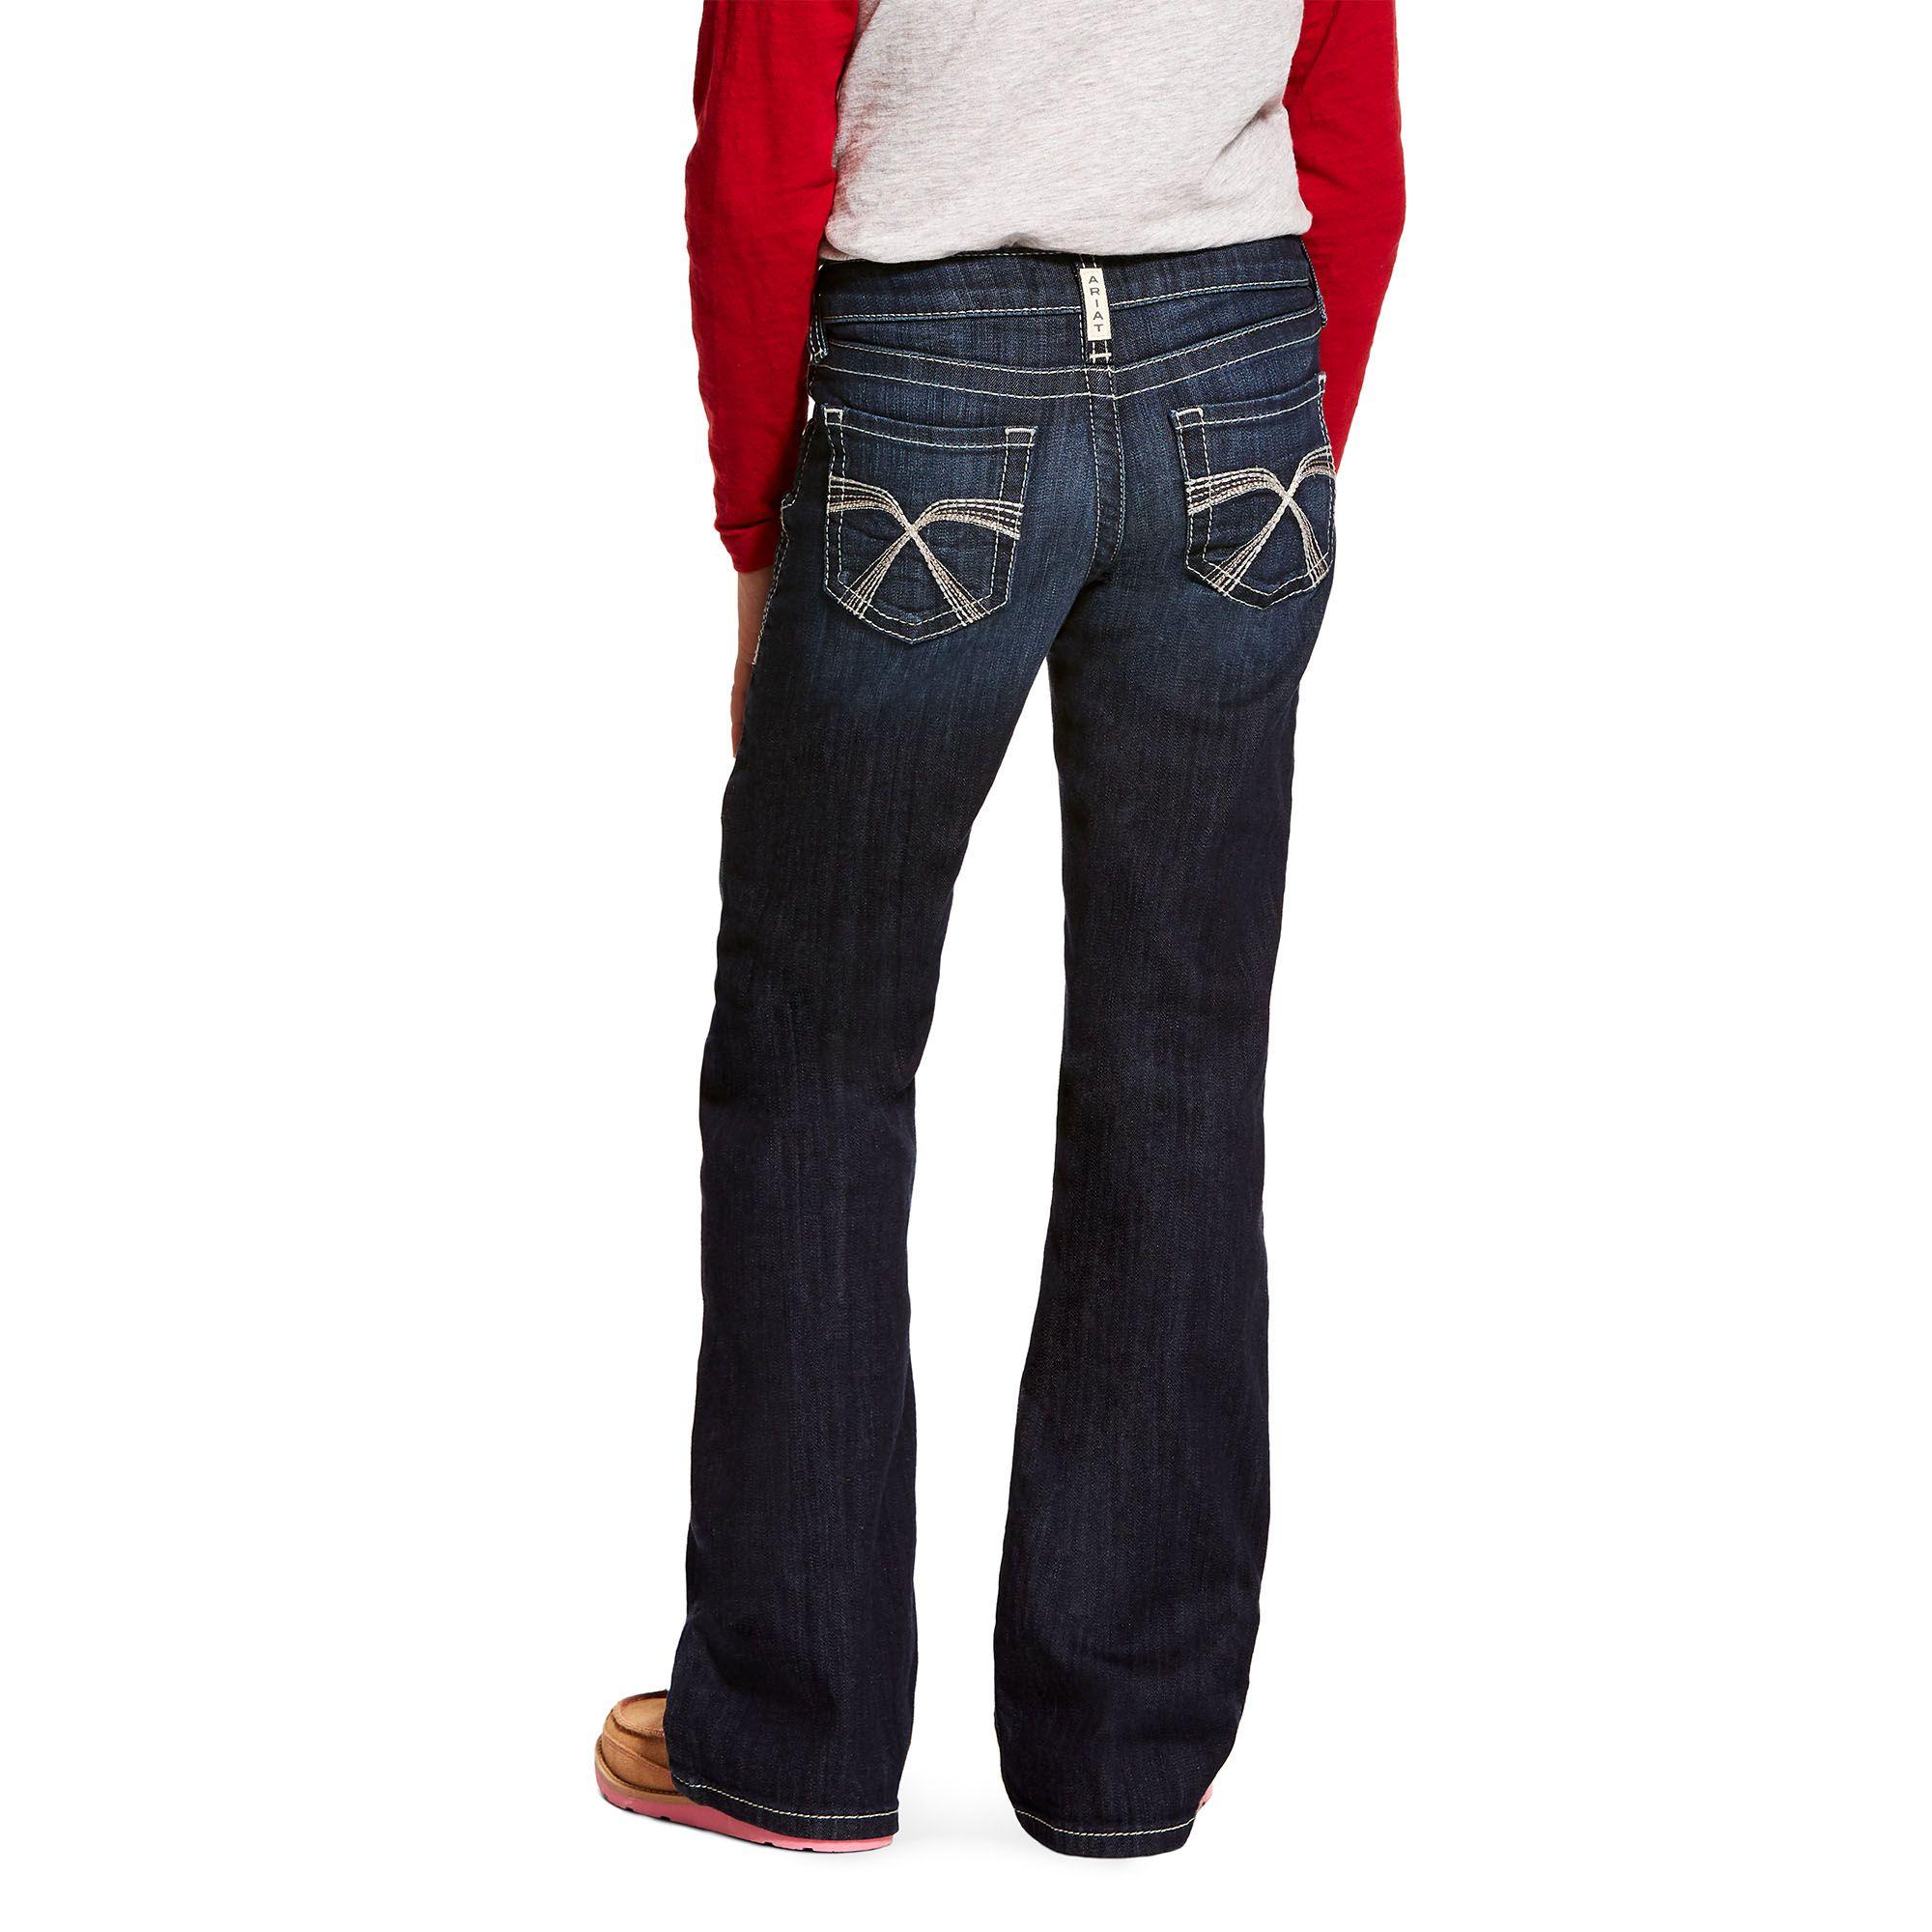 Lucky Brand Kids Girls Deandra Bootcut Jeans in Christi Wash Little Kids